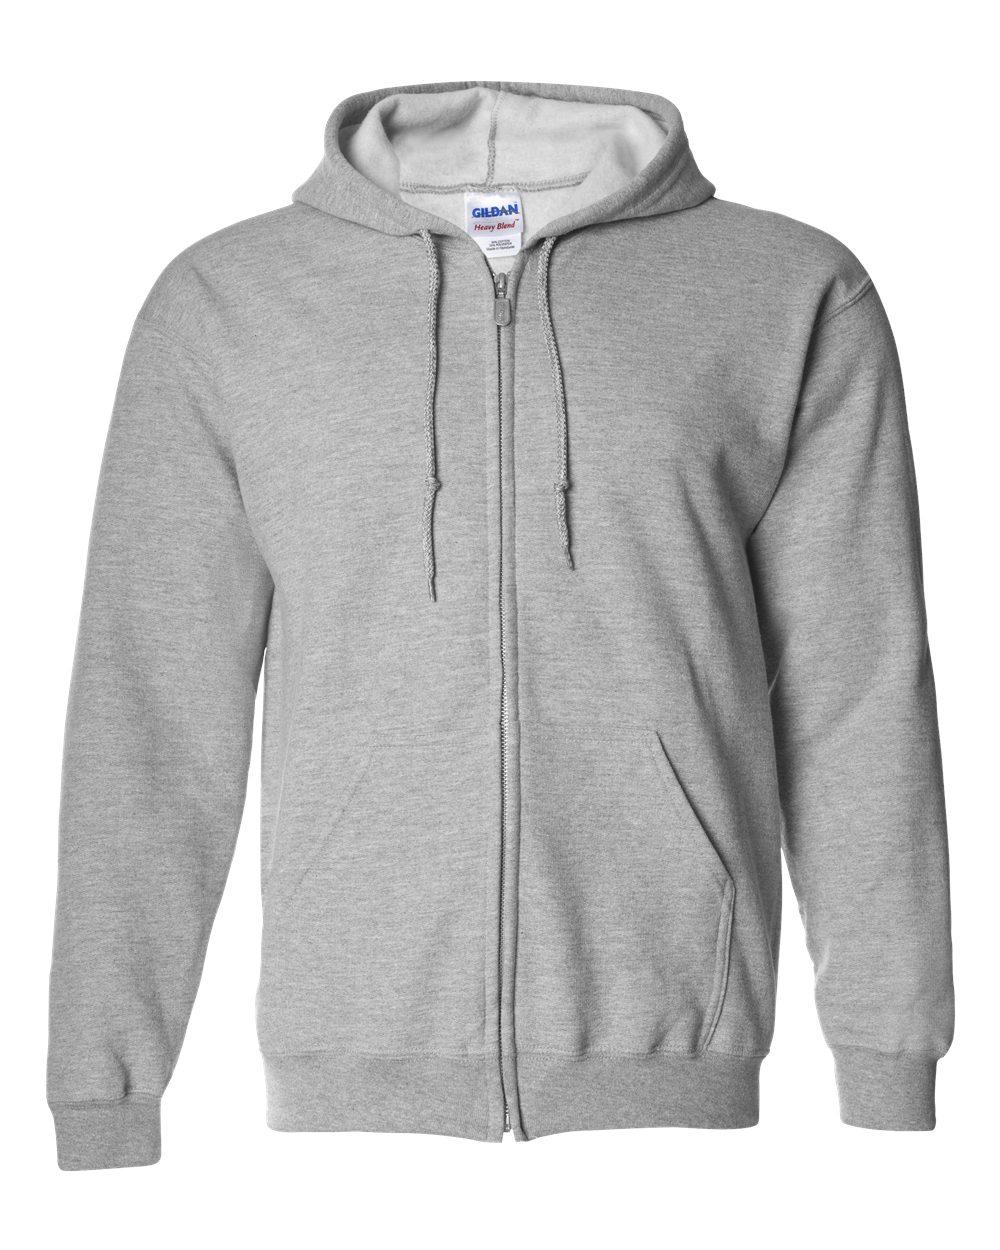 744dad1bb Picture of Gildan Heavyweight Blend Adult Full Zip Hooded Sweatshirt